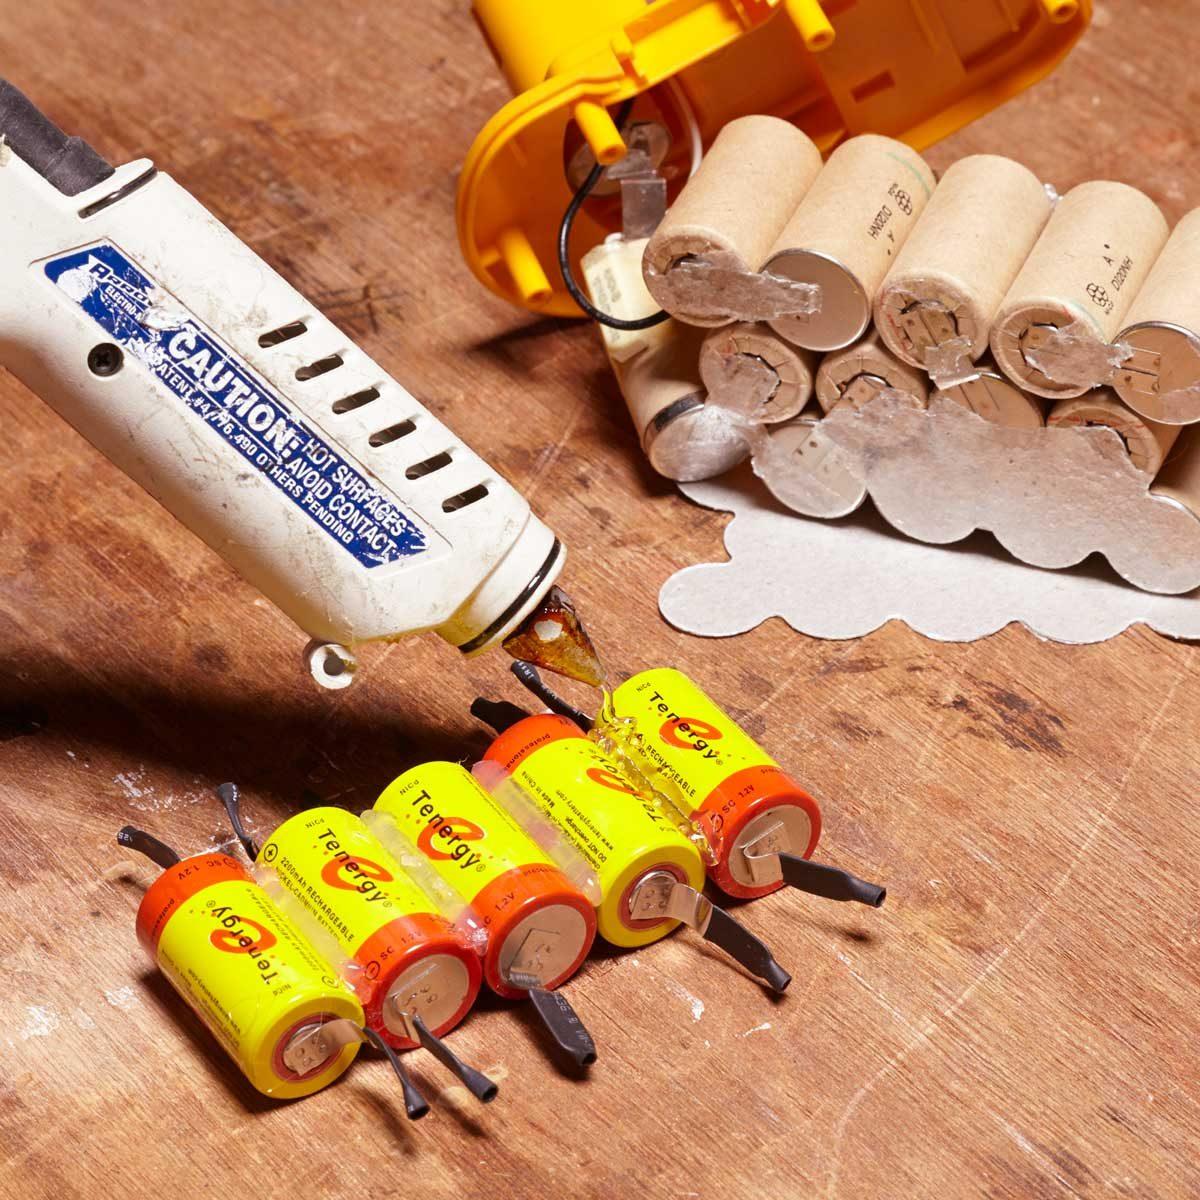 rebuild a cordless tool battery hot glue